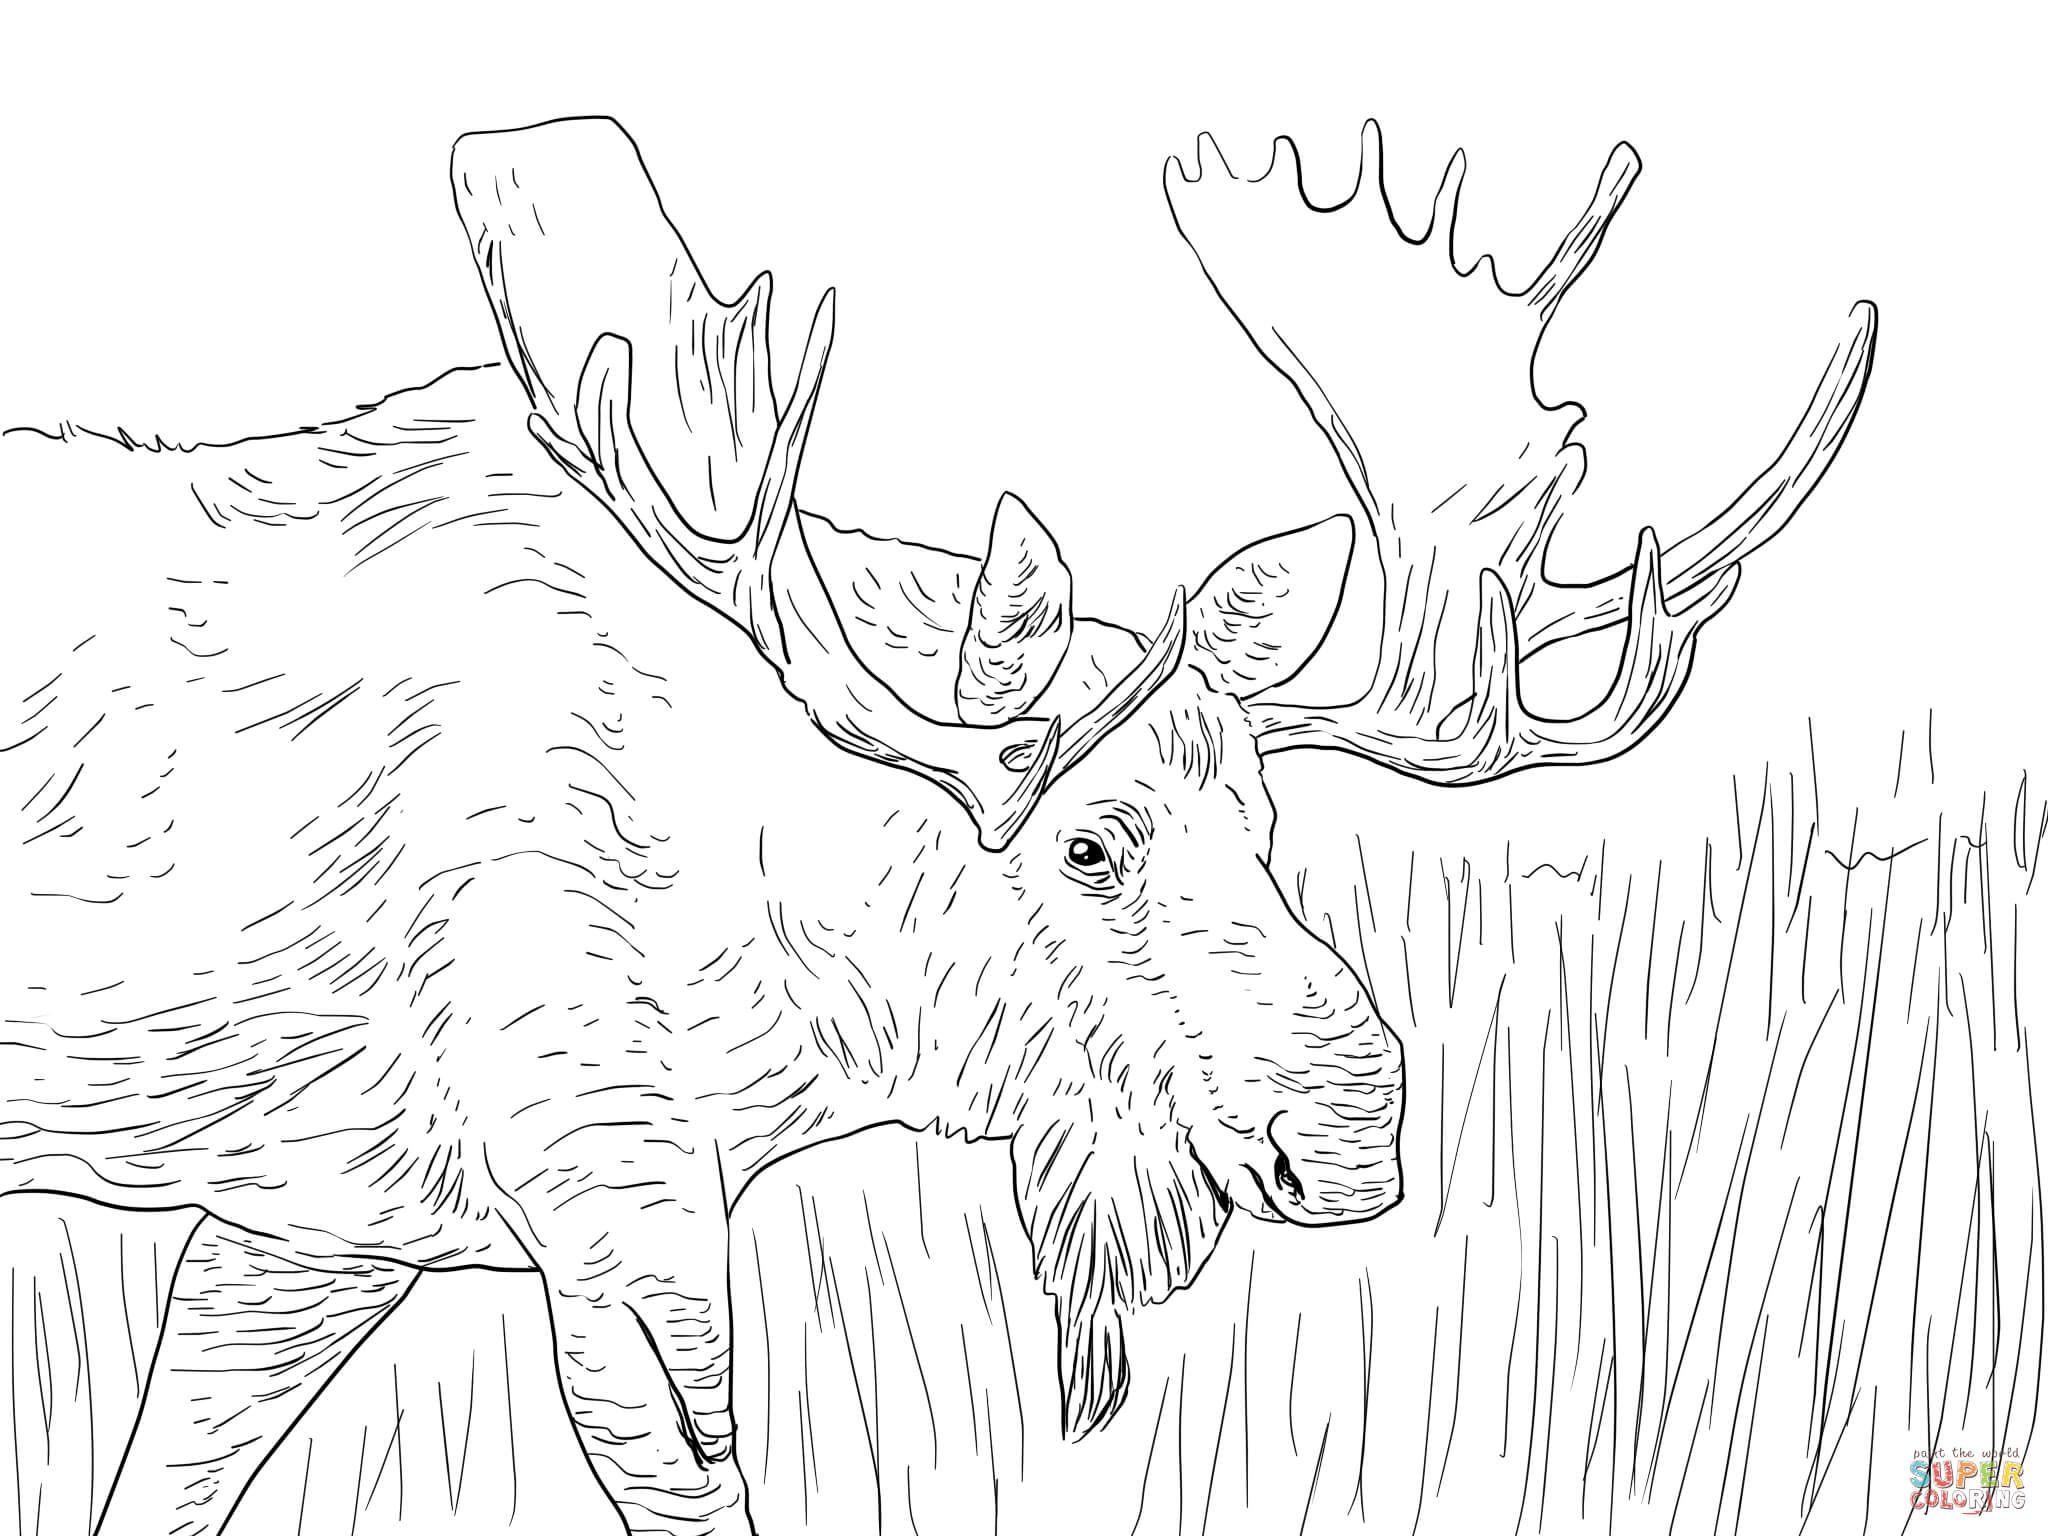 Http Www Supercoloring Com Sites Default Files Styles Coloring Full Public Cif 2013 10 Alaska Moose Animal Coloring Pages Horse Coloring Pages Coloring Pages